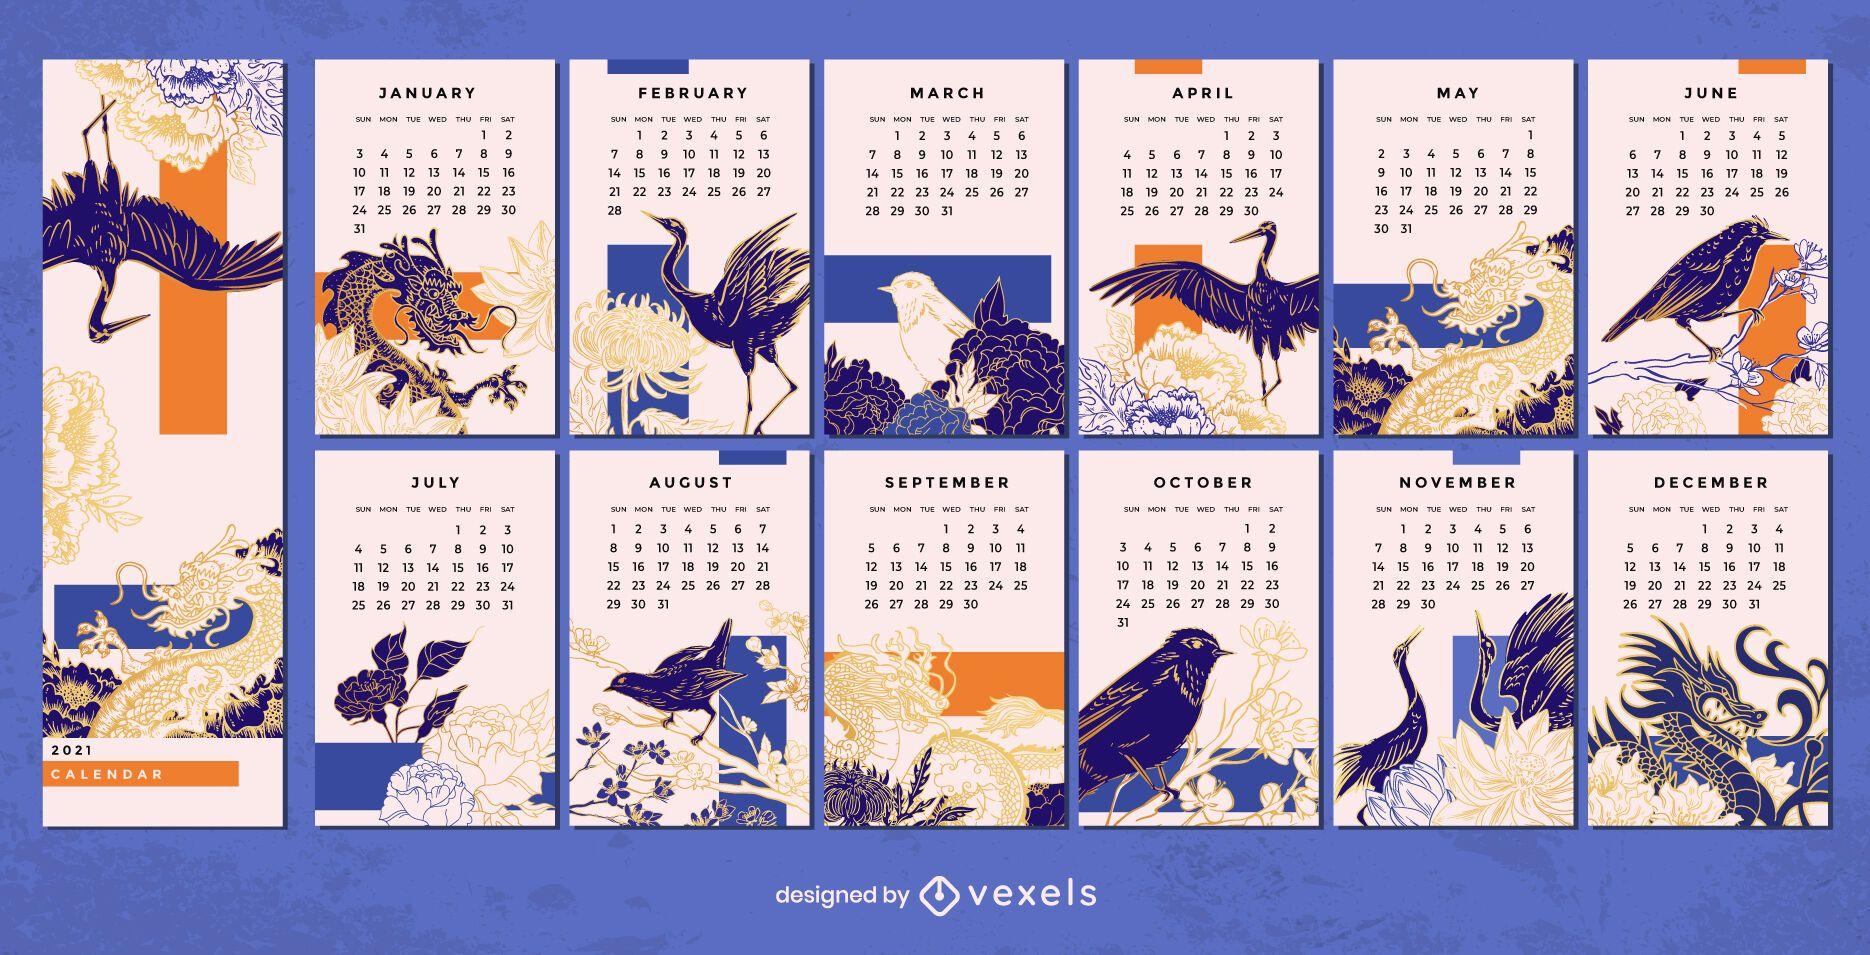 Chinese 2021 calendar design